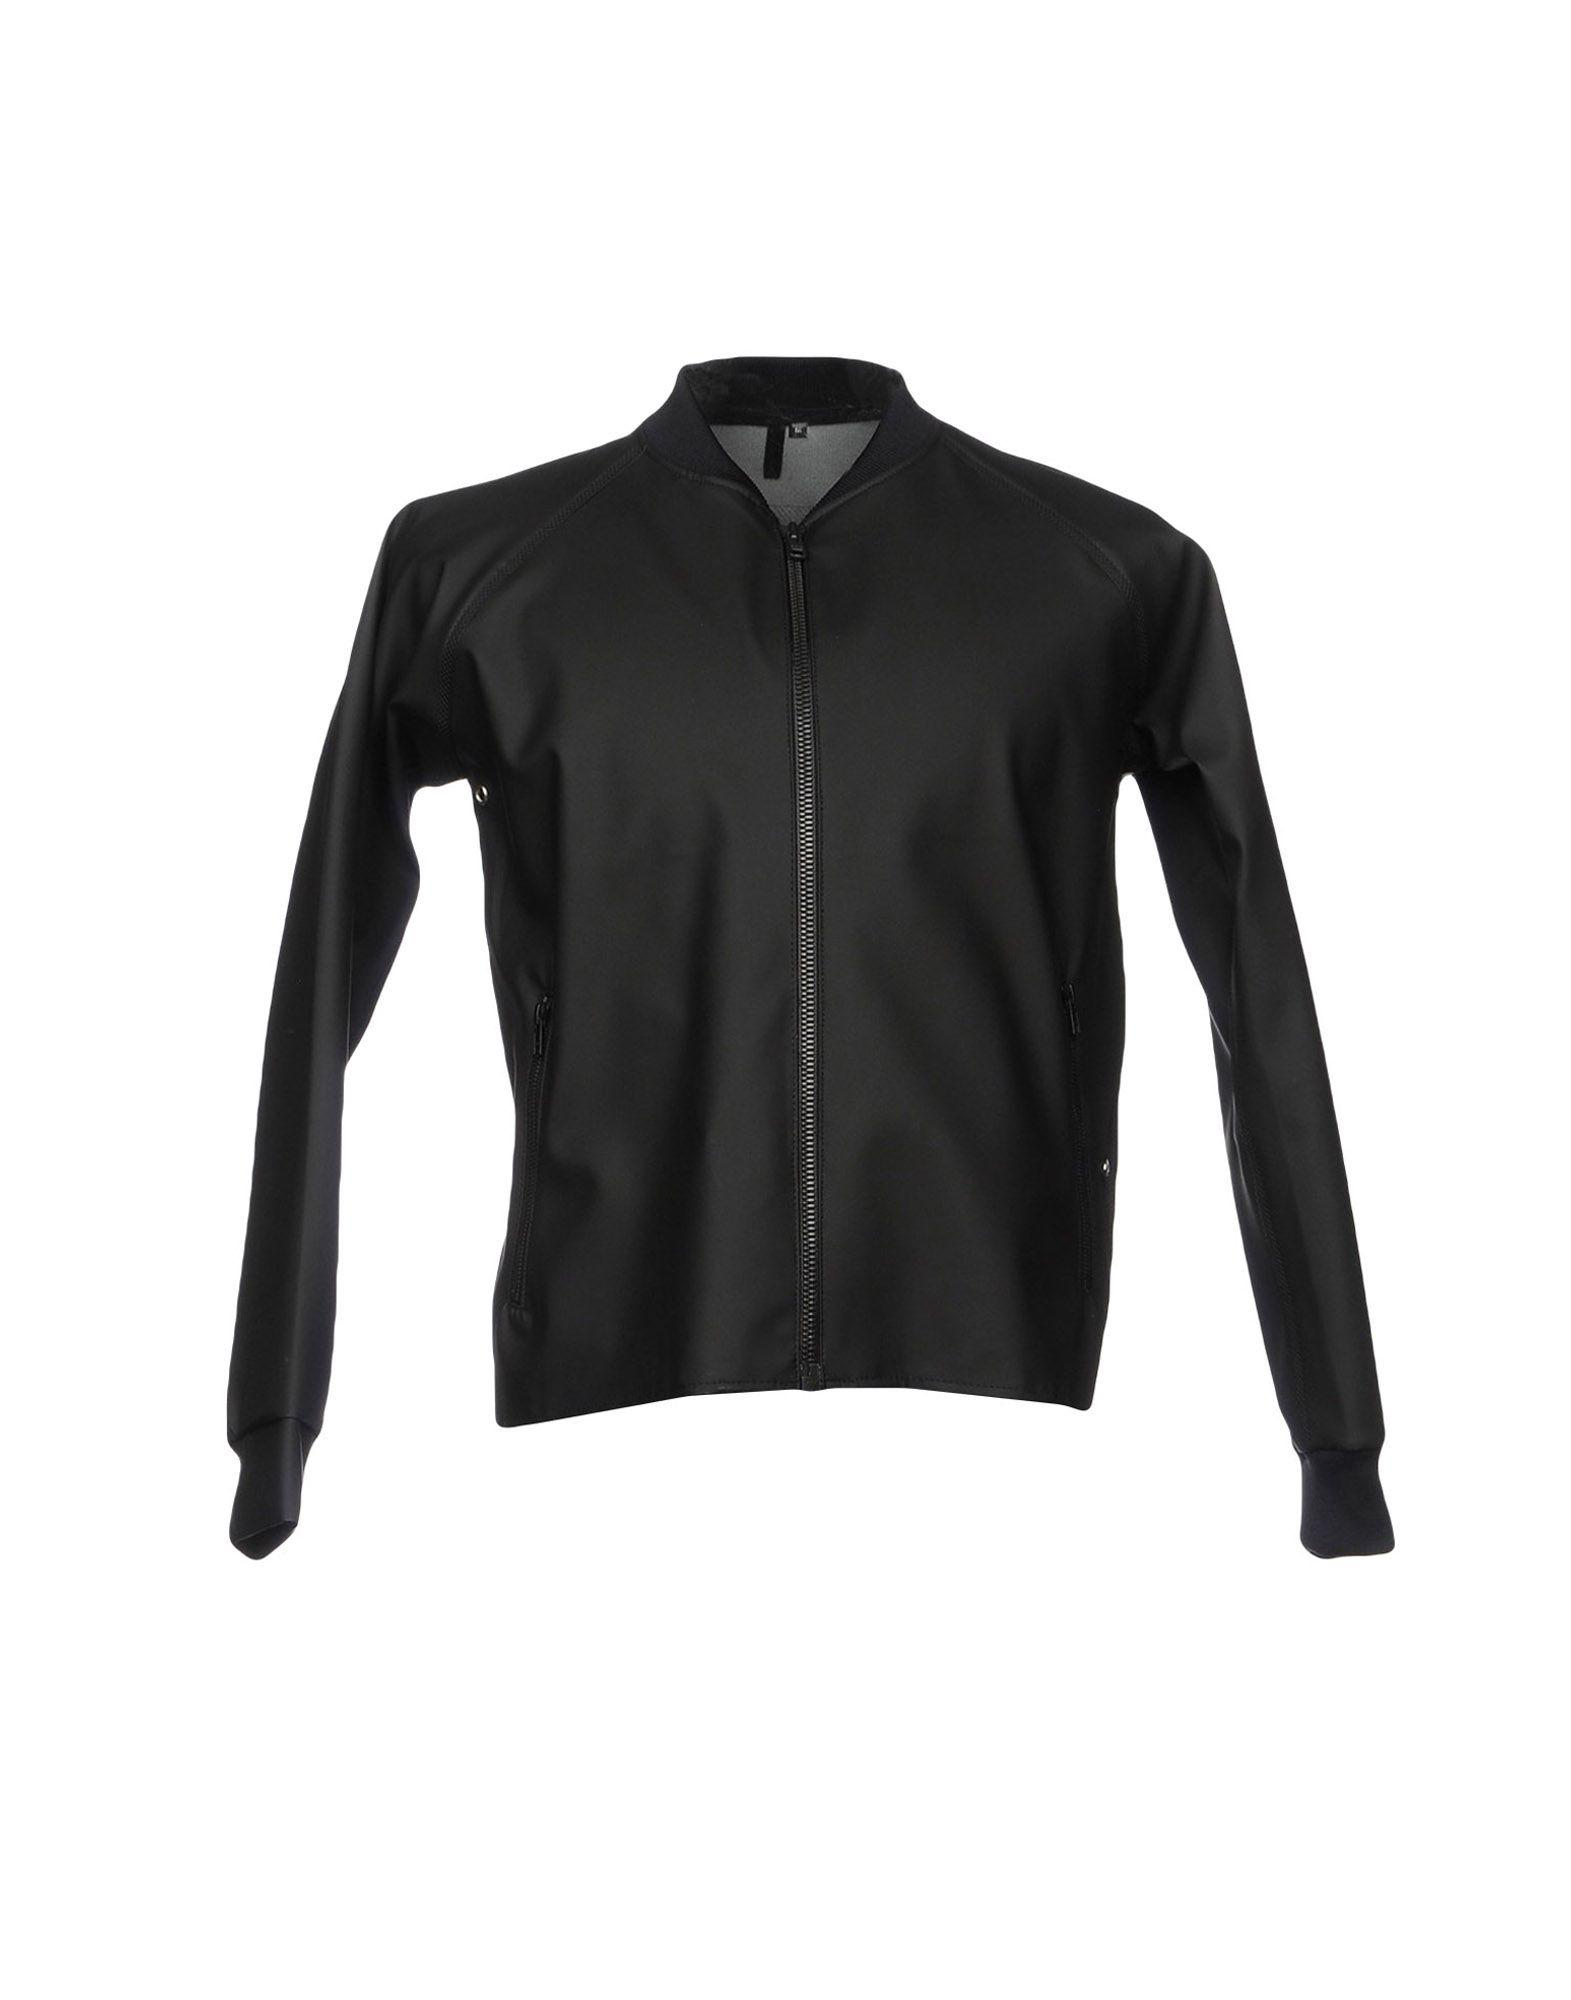 Elka Jackets In Black